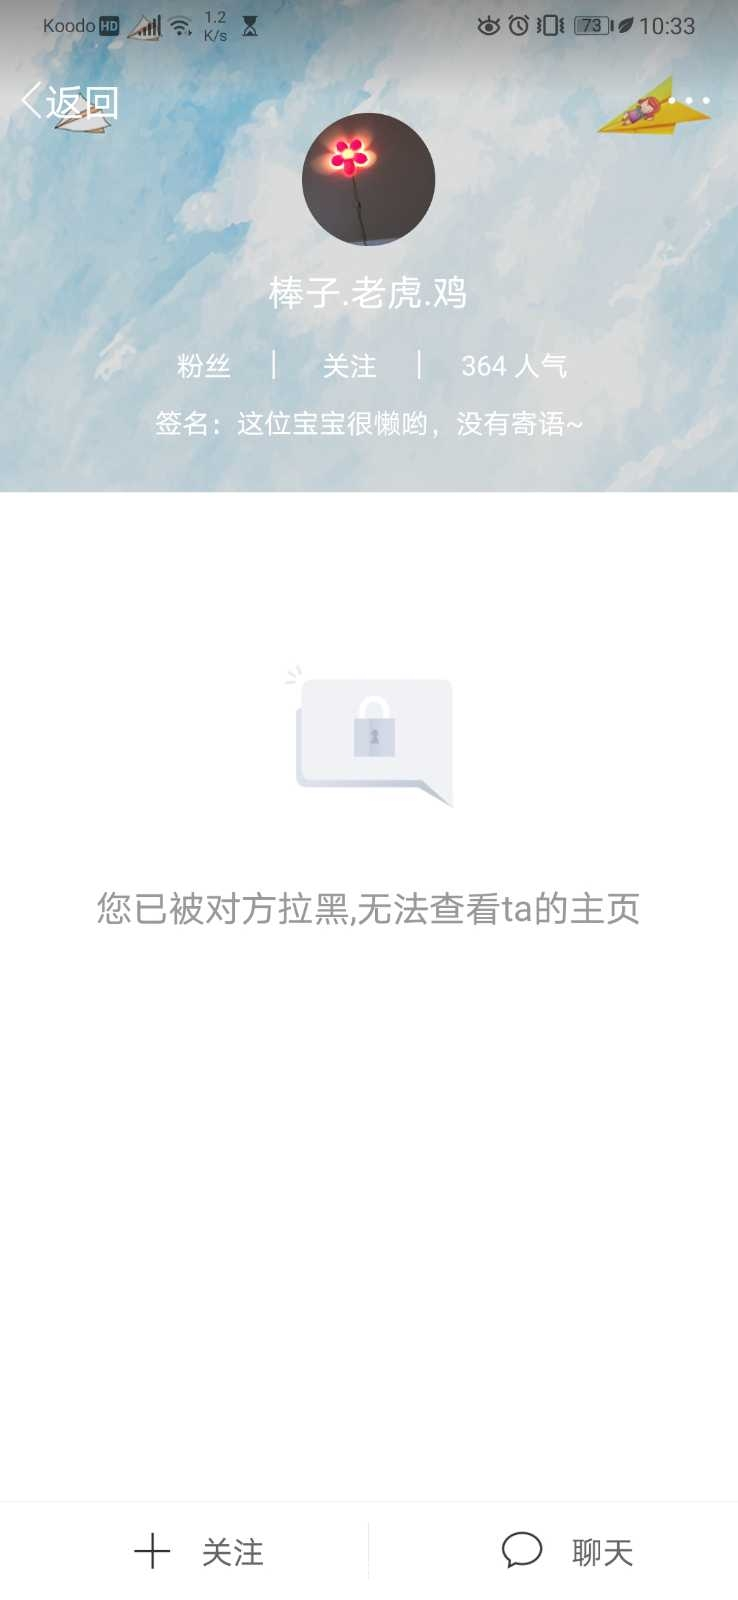 Screenshot_20200628_103313_com.appbyme.app129158.jpg